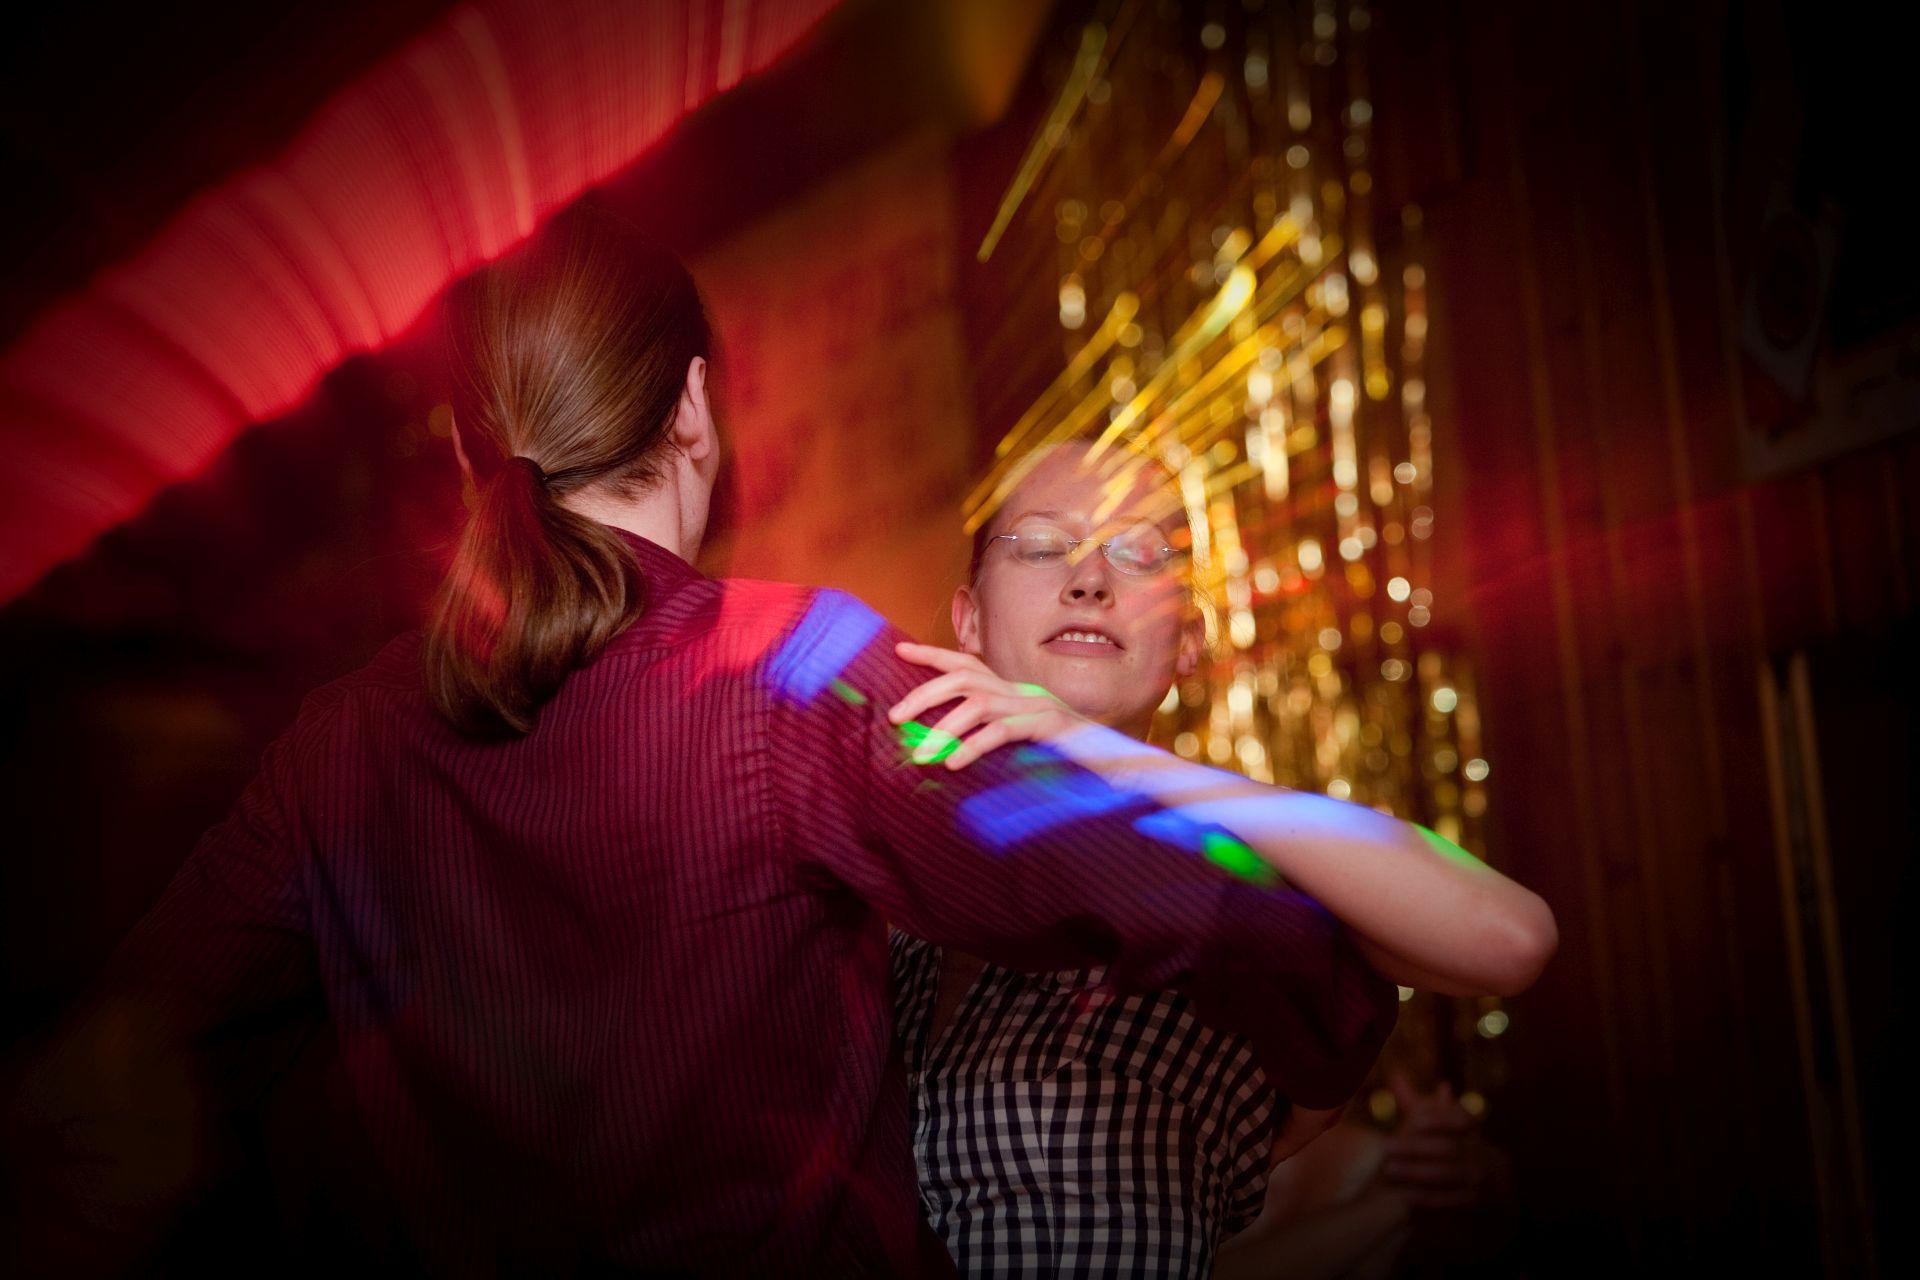 E1 Concert en feest Dansen bij Kluver-2